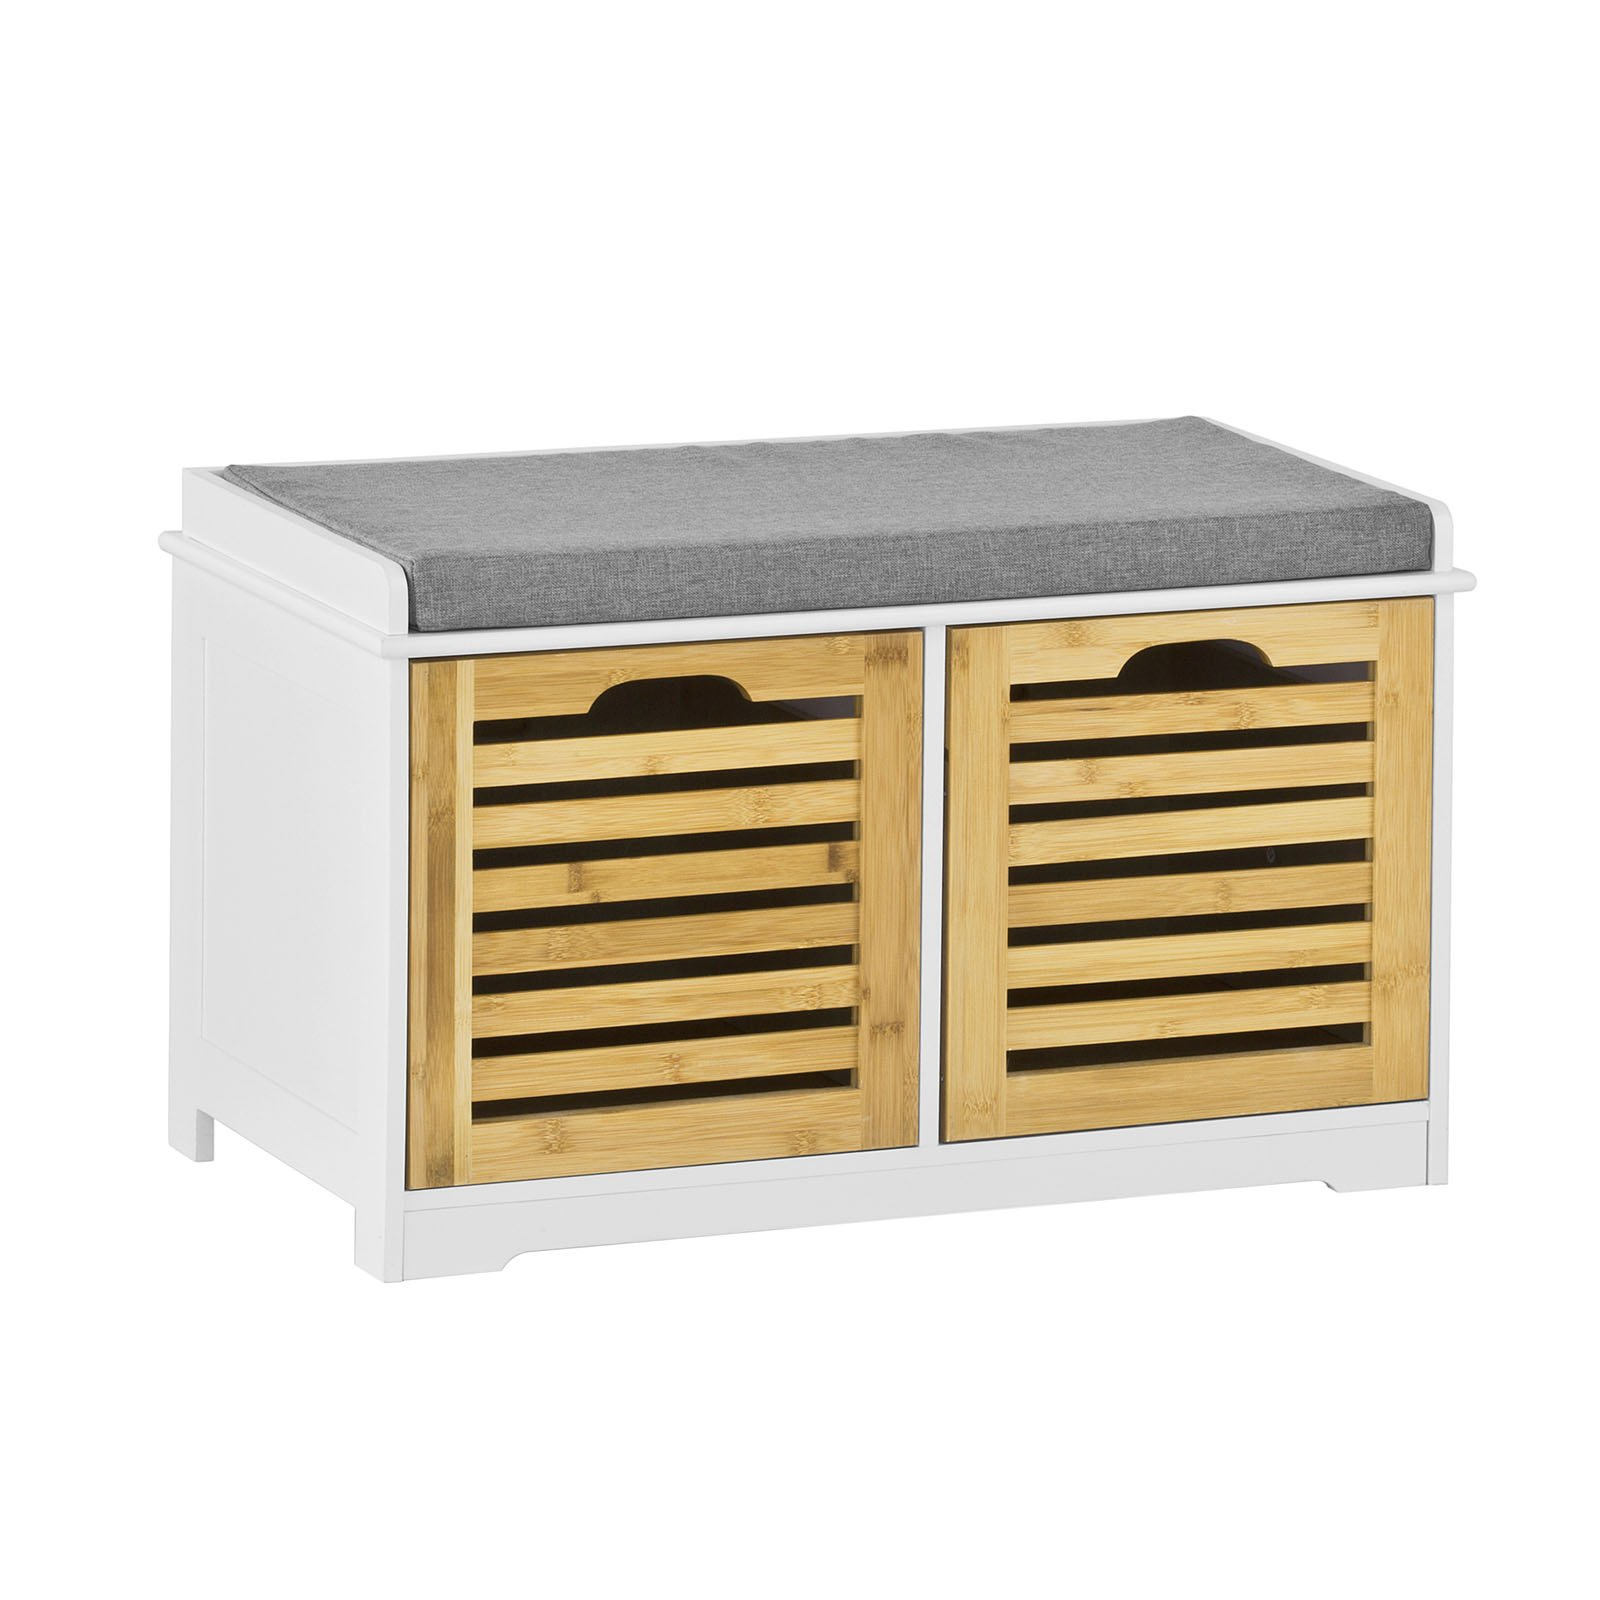 SoBuy Storage Bench 2 Drawers U0026 Seat Cushion, Shoe Cabinet Storage Unit  Bench, FSR23